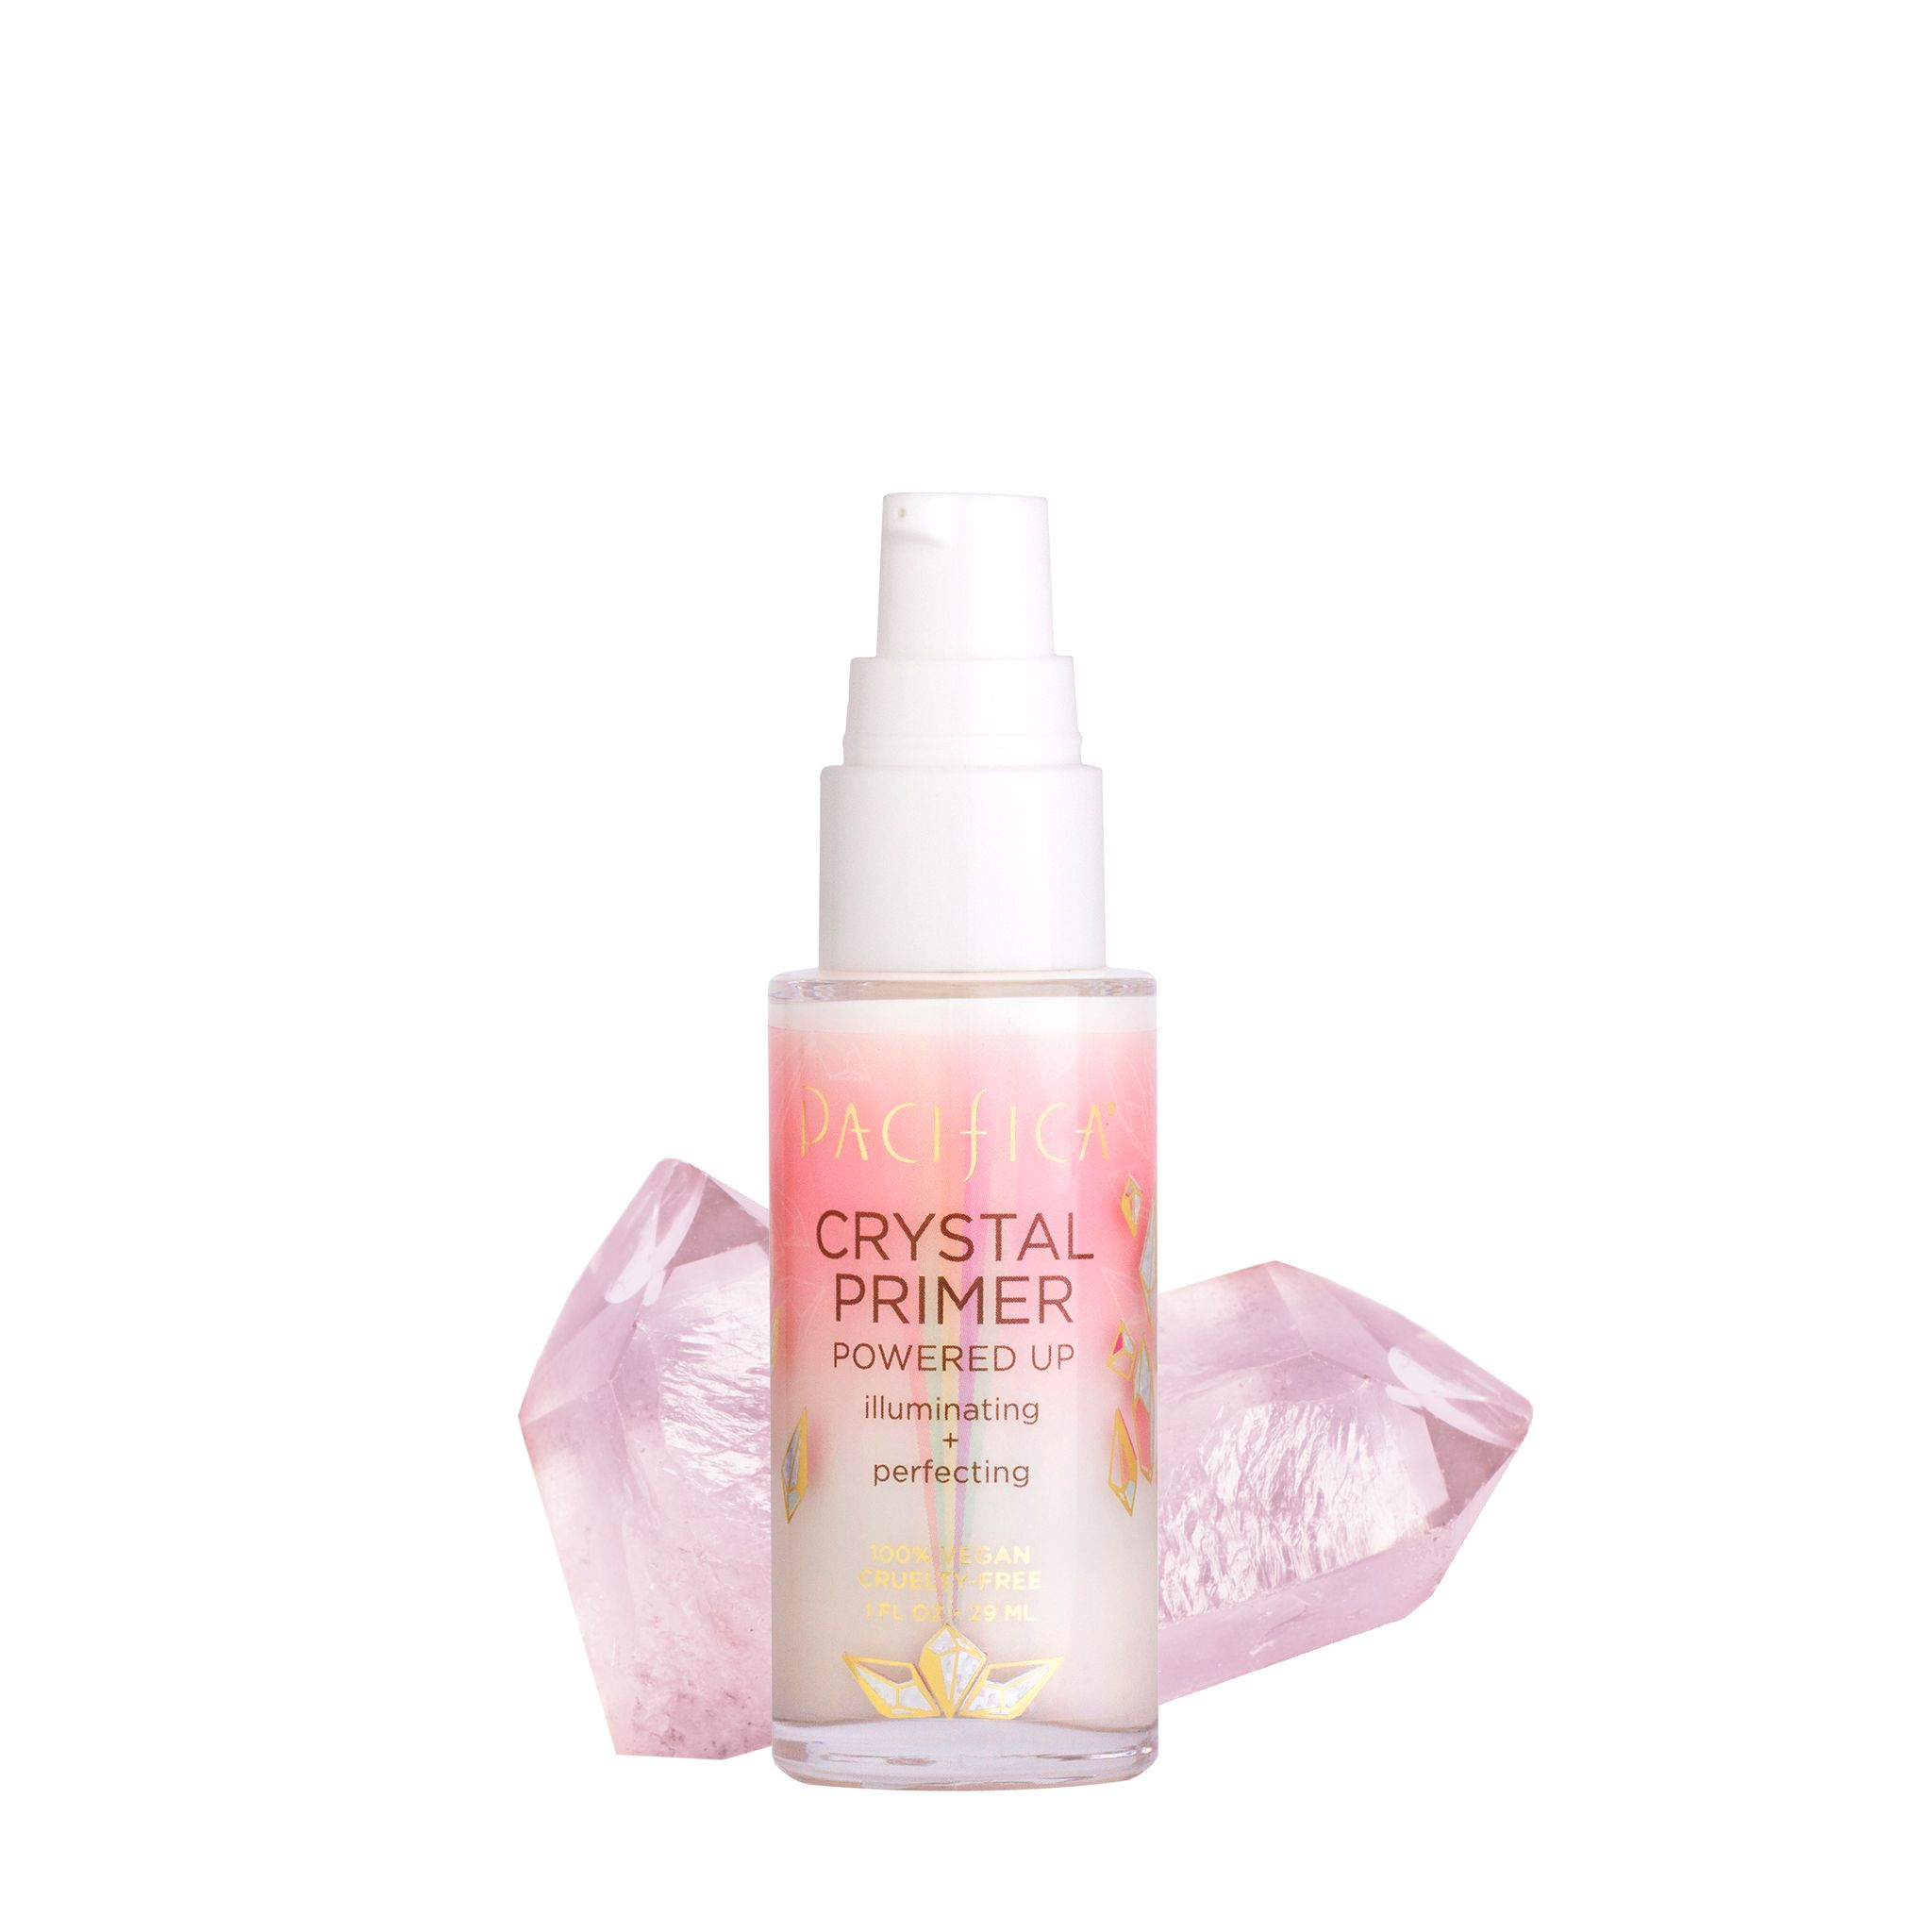 Pacifica Crystal Primer Ulta Beauty Younique Skin Care Oil Control Products Drugstore Bb Cream